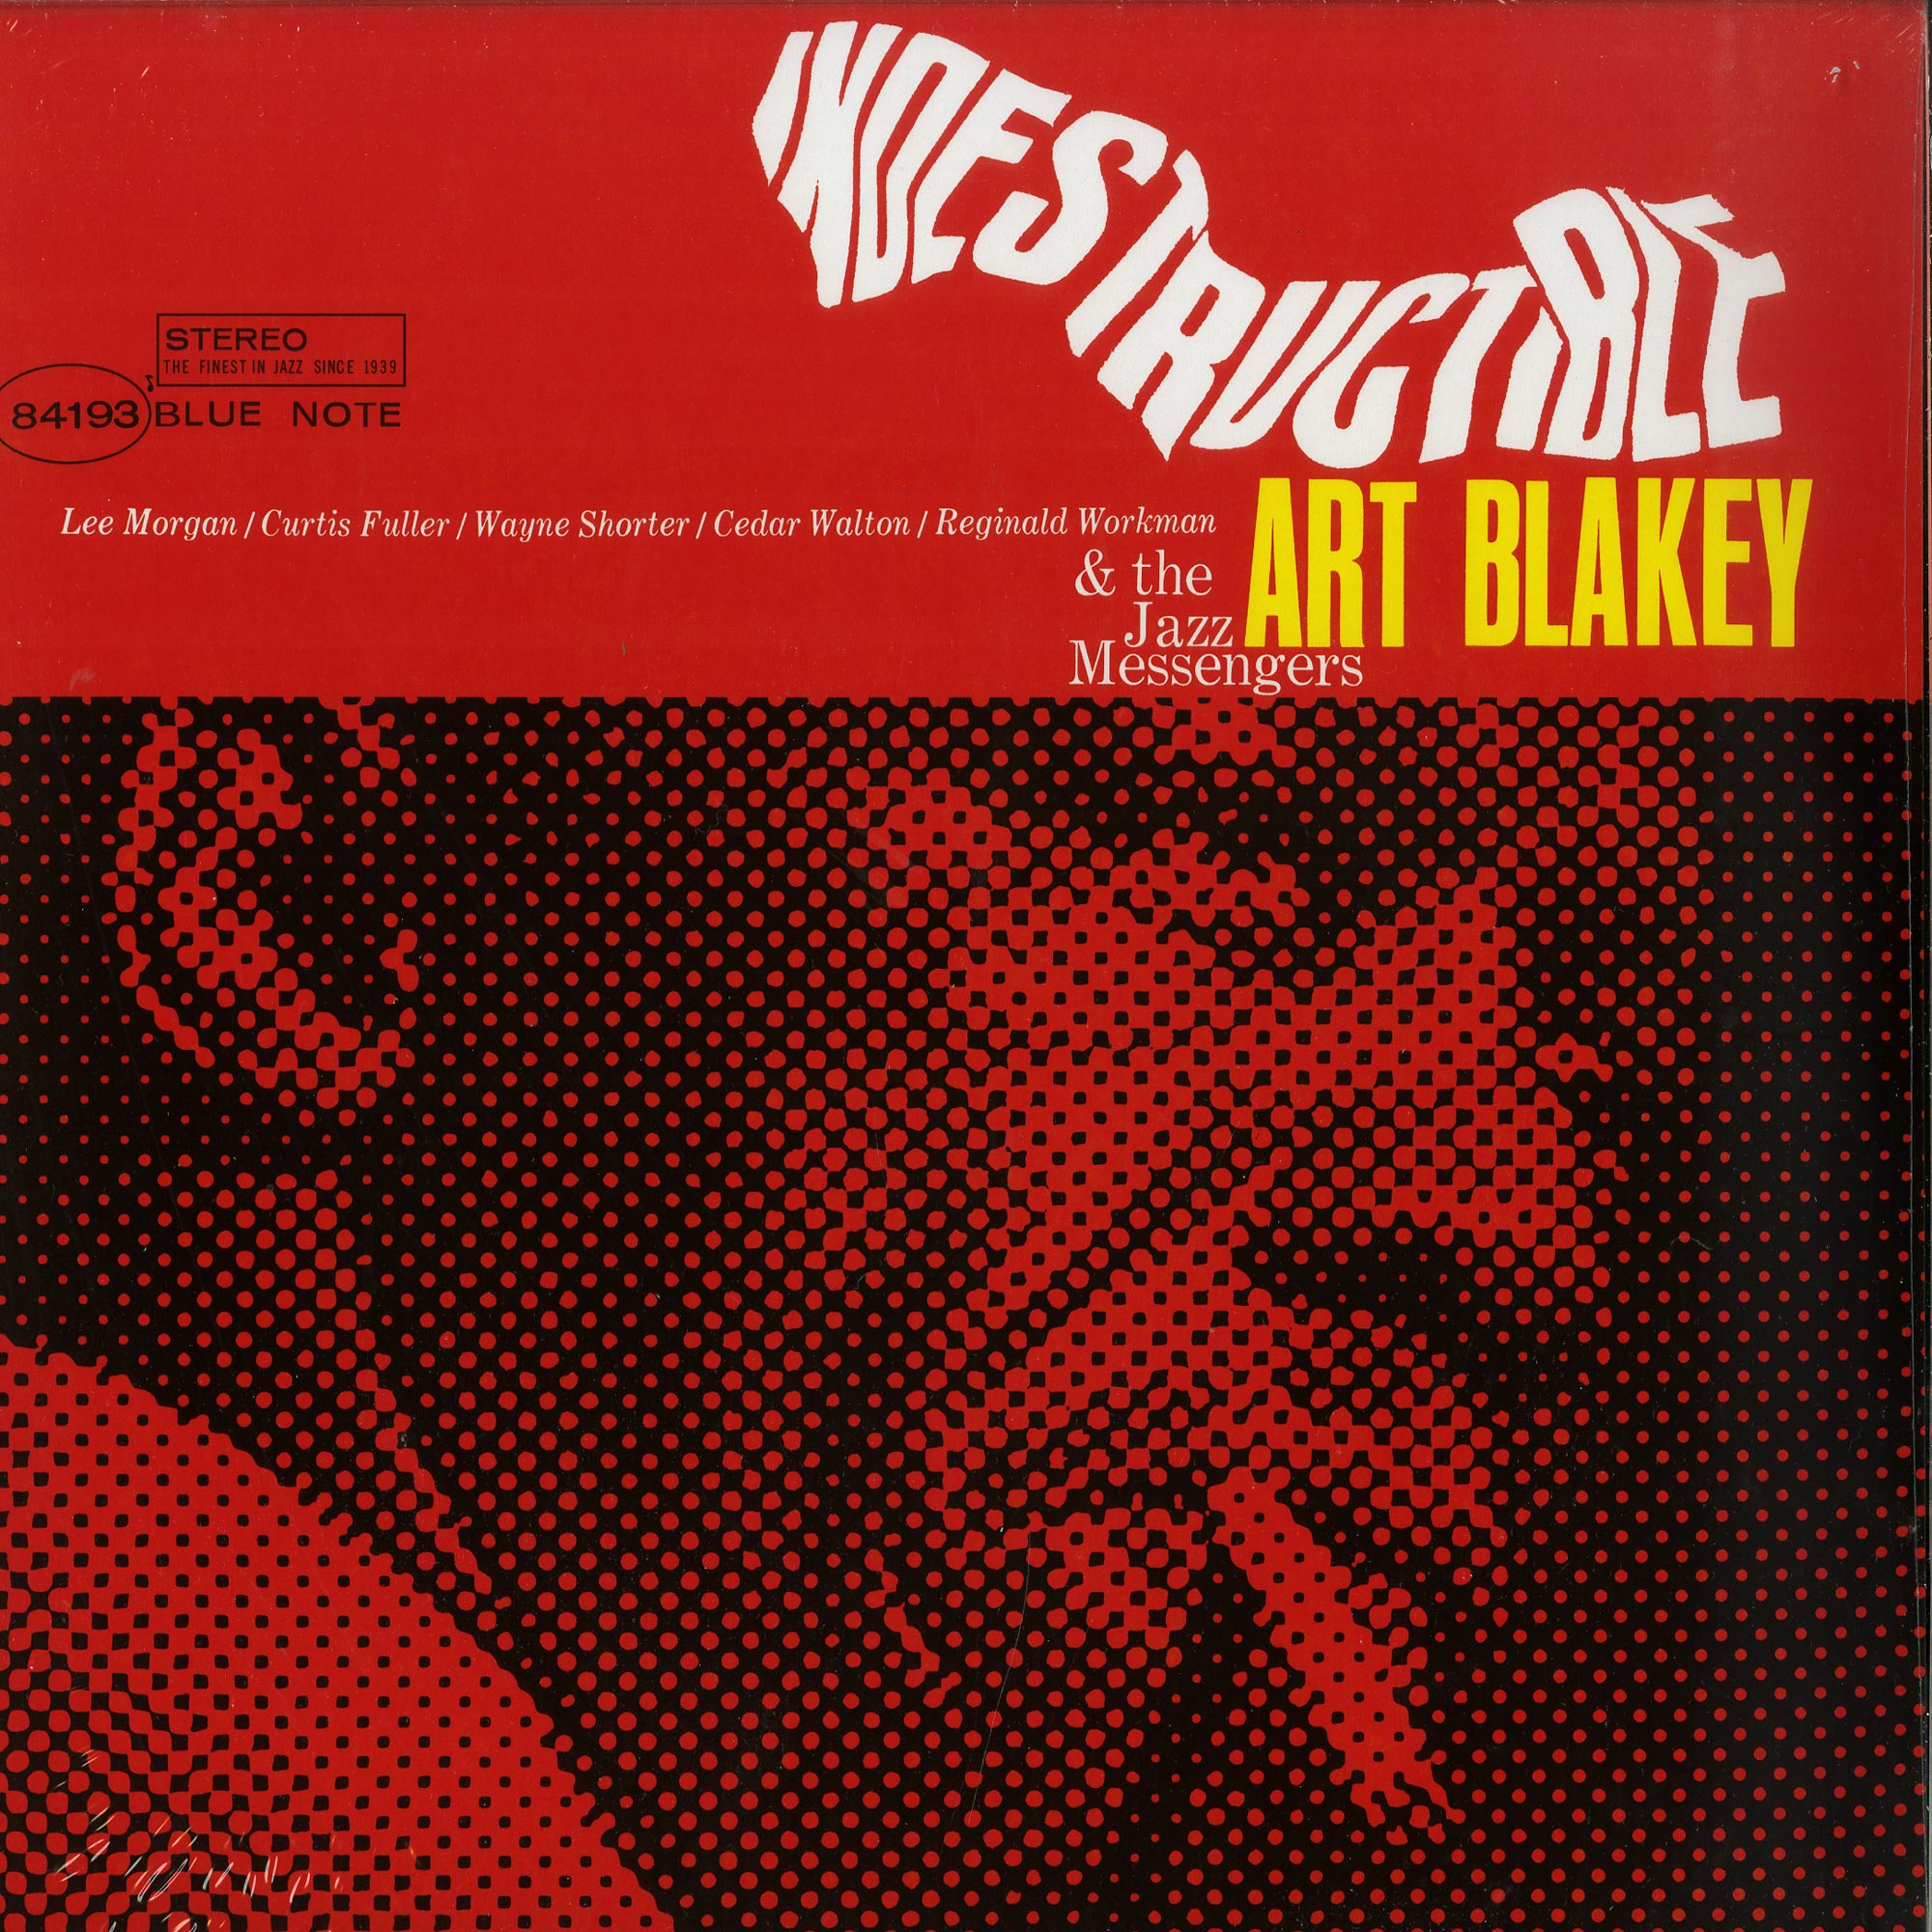 Art Blakey & The Jazz Messengers - INDESTRUCTIBLE